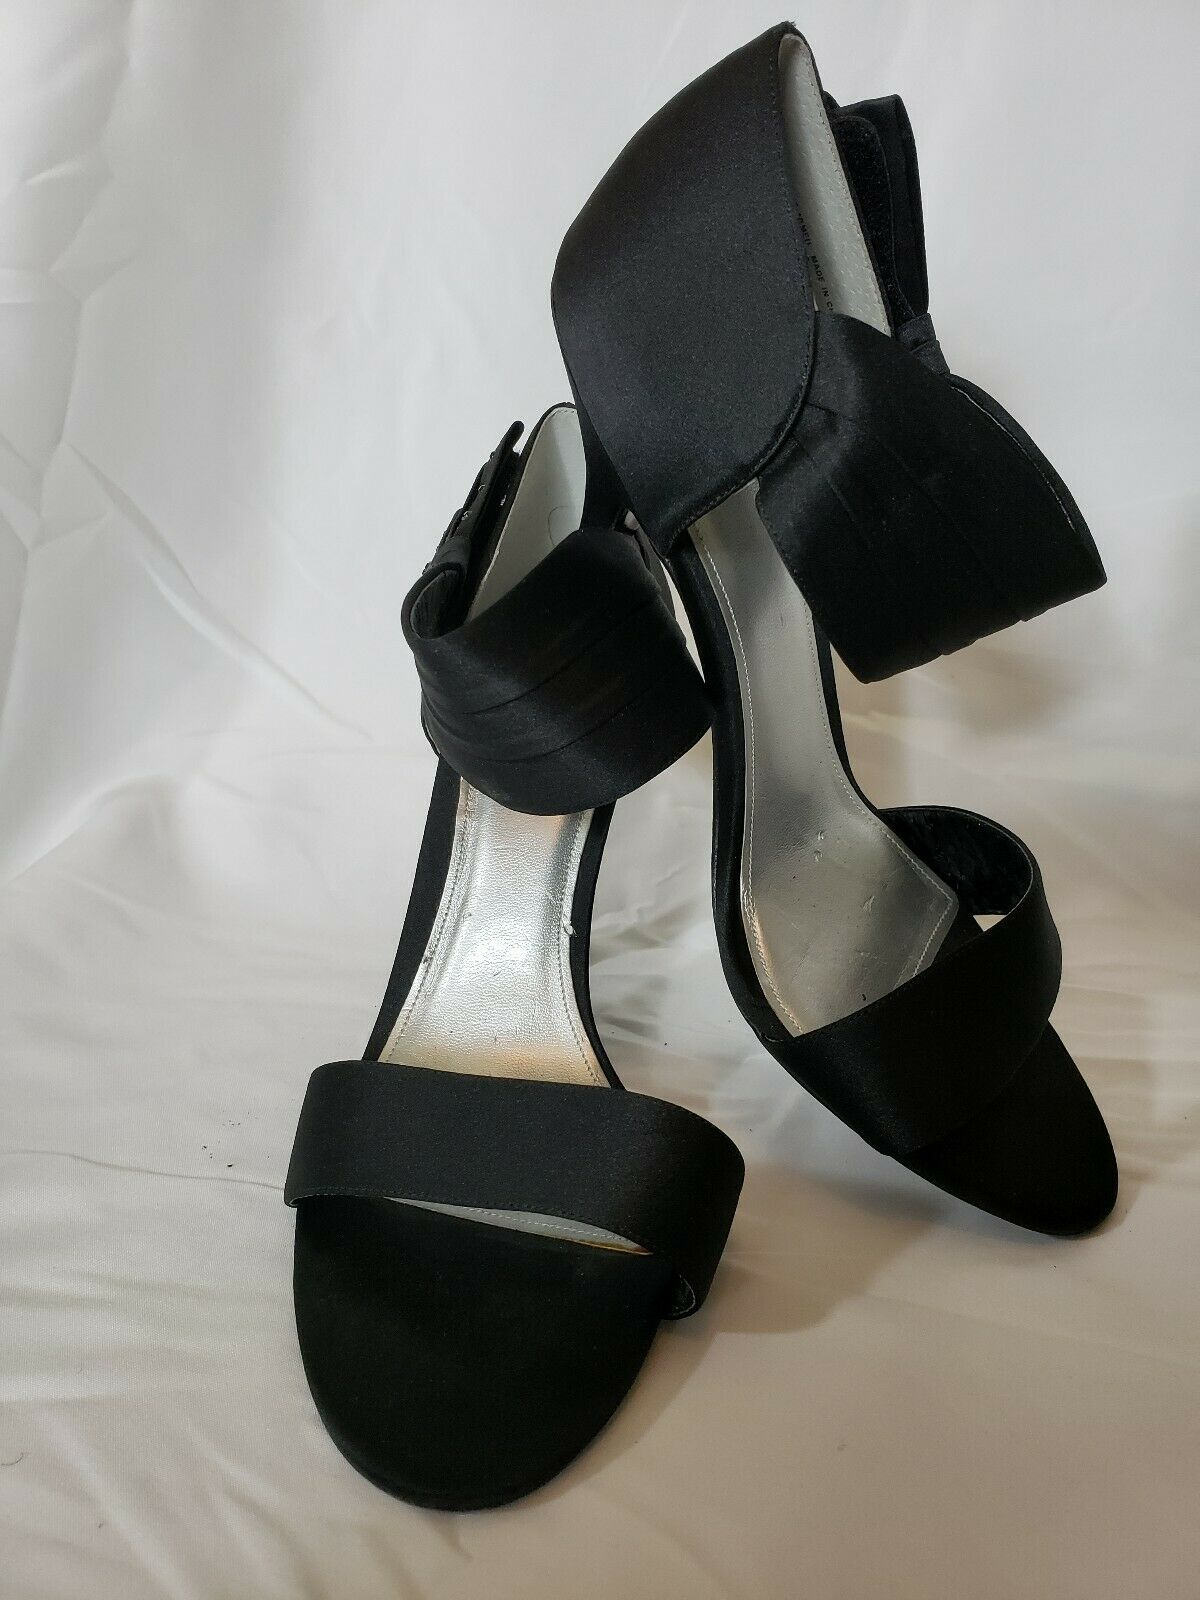 APT 9 Womens Black Satin heels Pumps Big Bow Rhinestone sz 10M Wedding Shoes